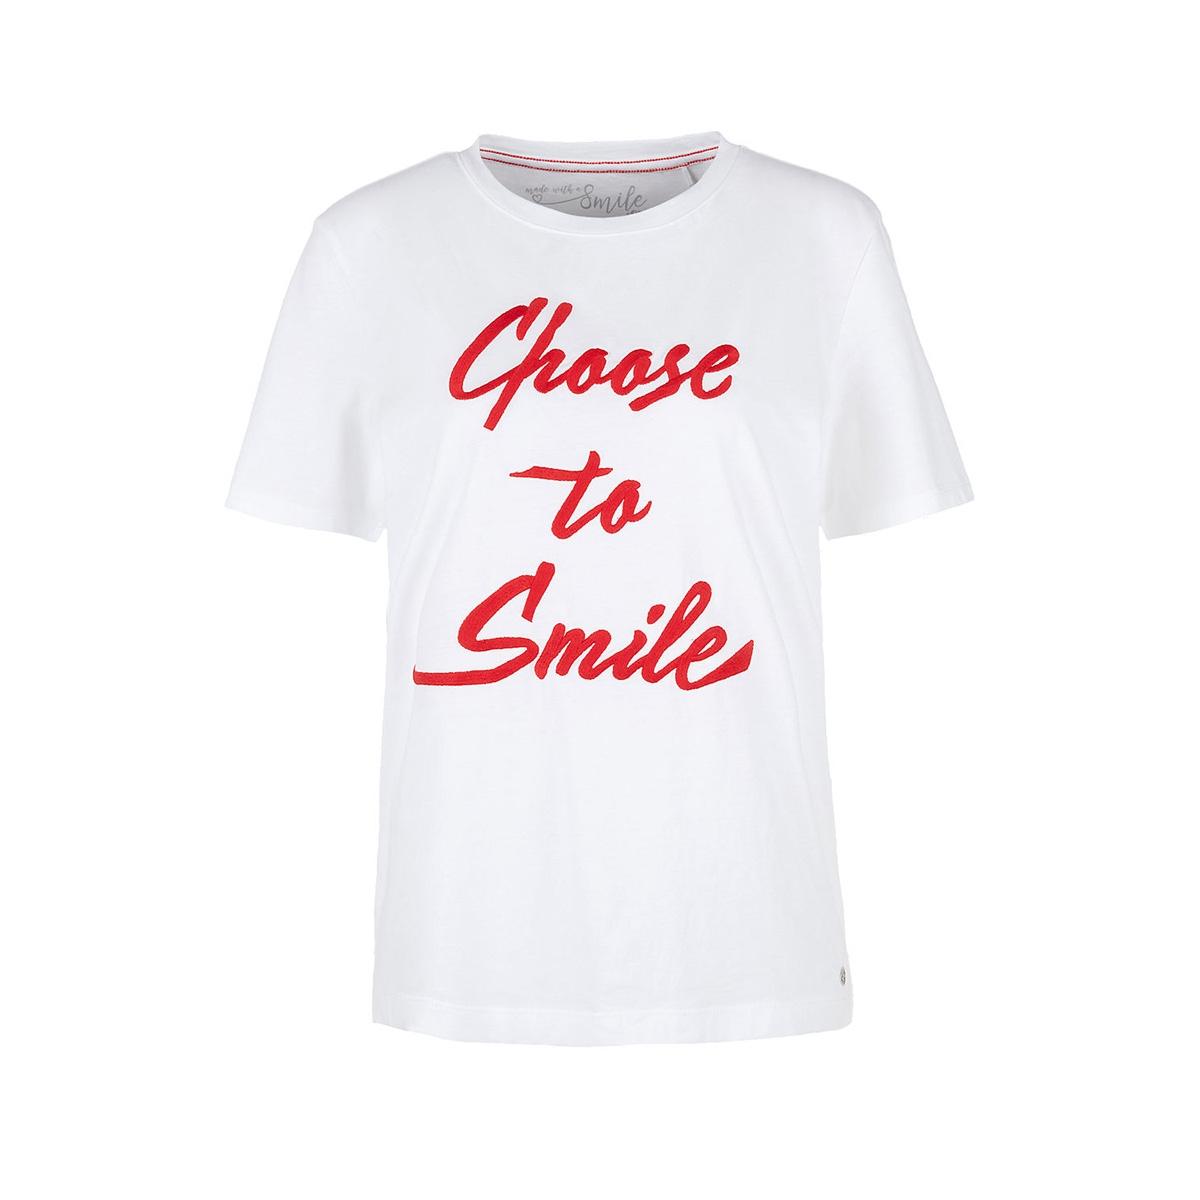 t shirt 14003324817 s.oliver t-shirt 01d1